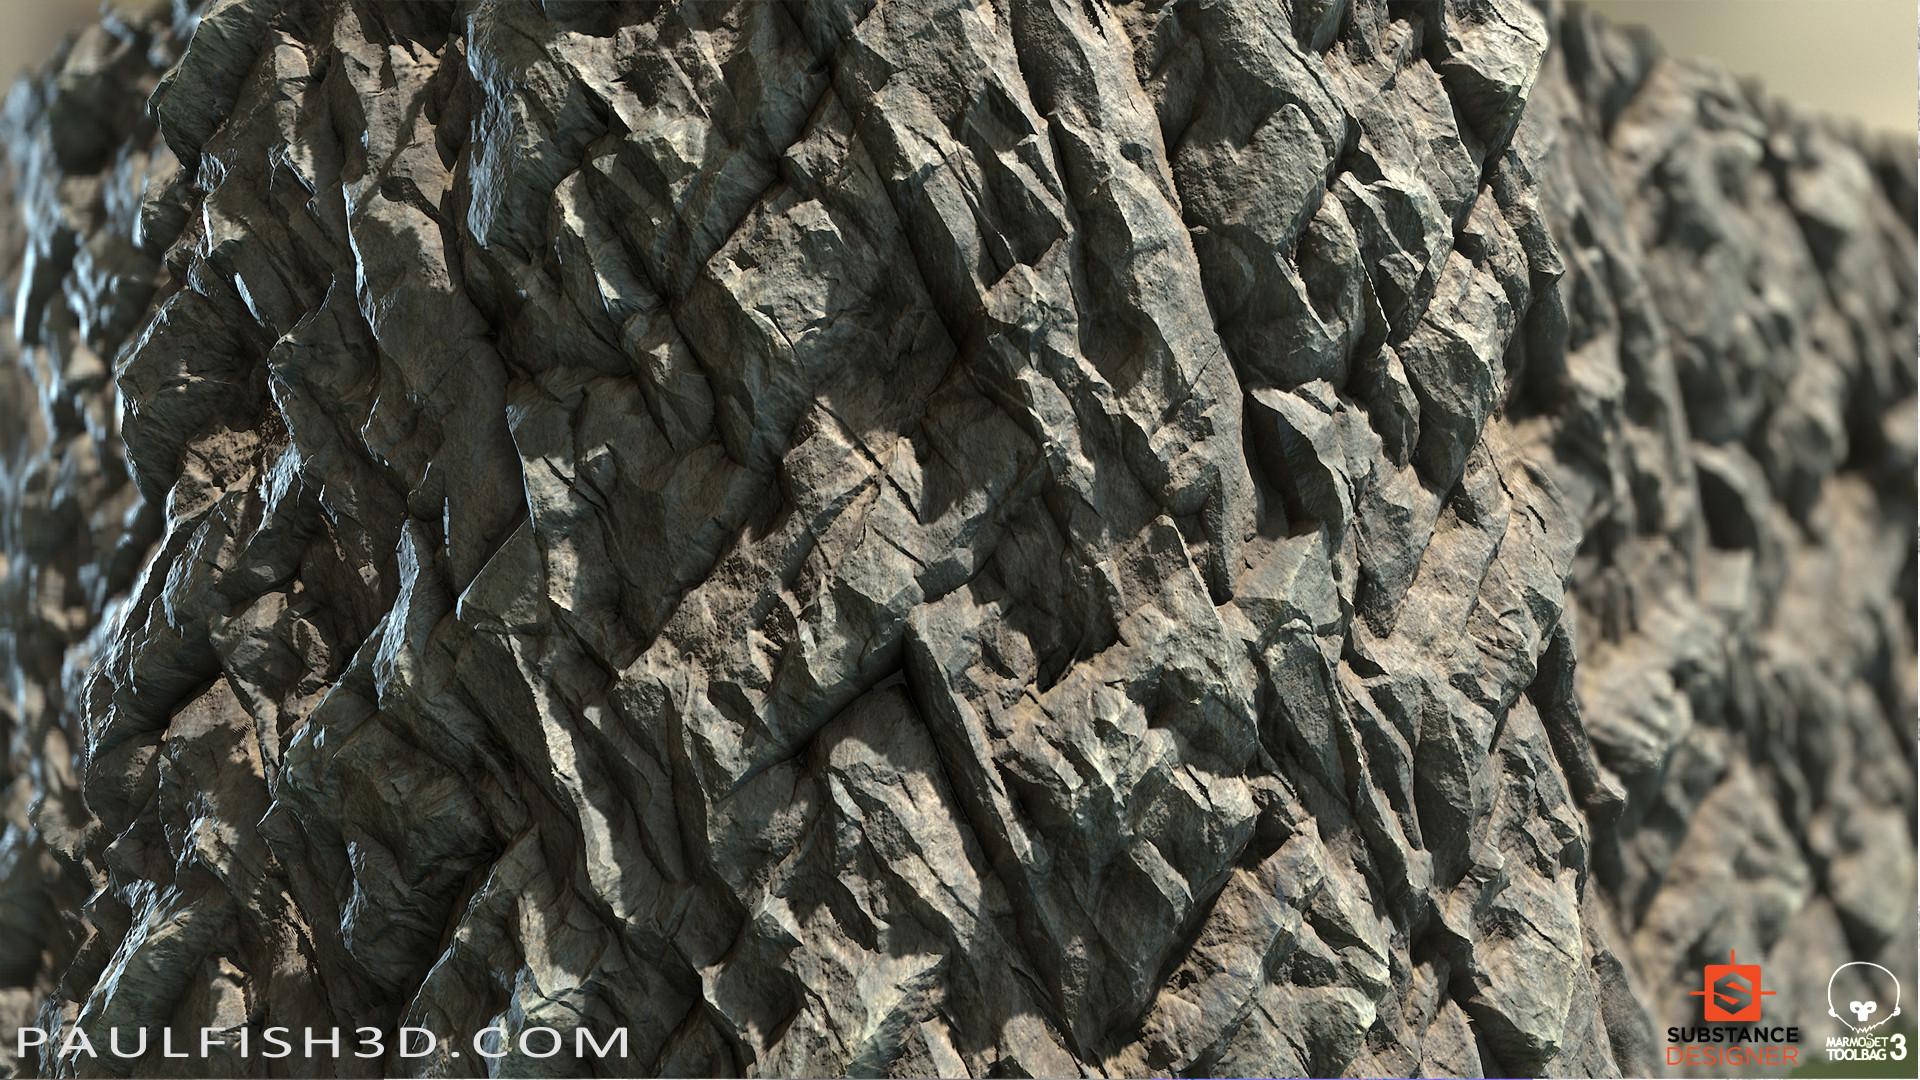 Paul fish stone cliff dark 02